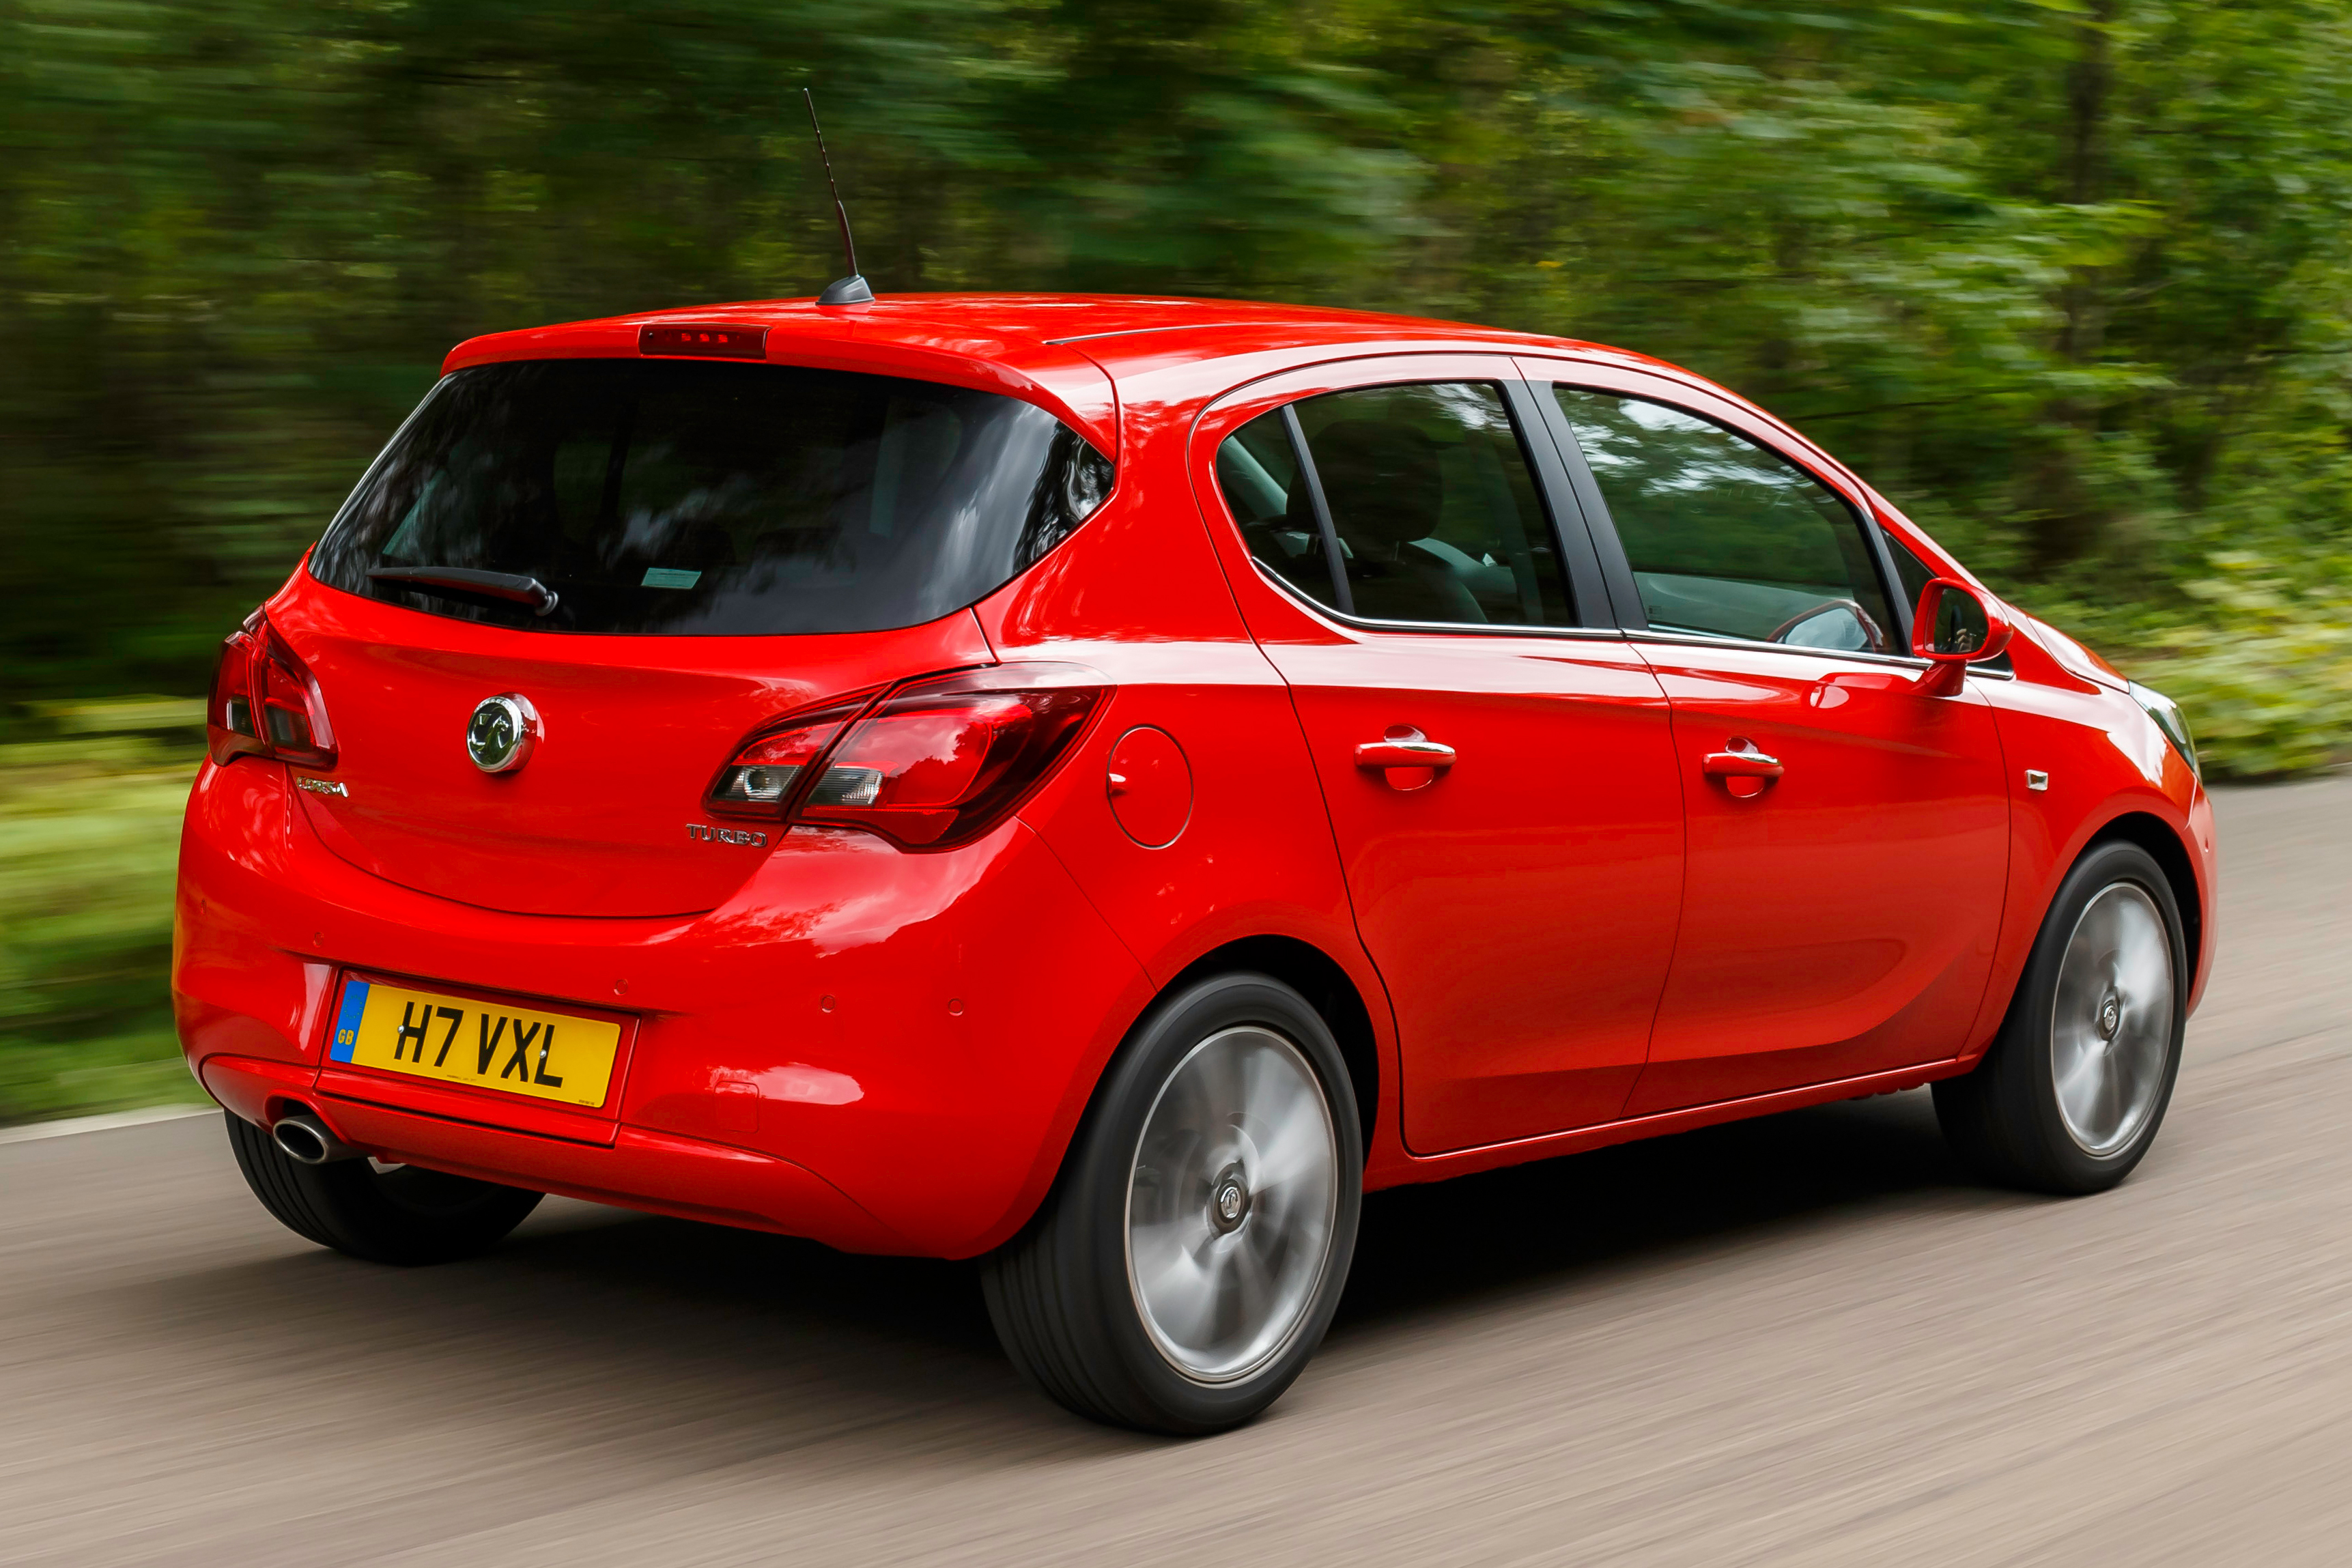 Vauxhall/Opel Corsa – fourth-gen supermini unveiled Image 257661